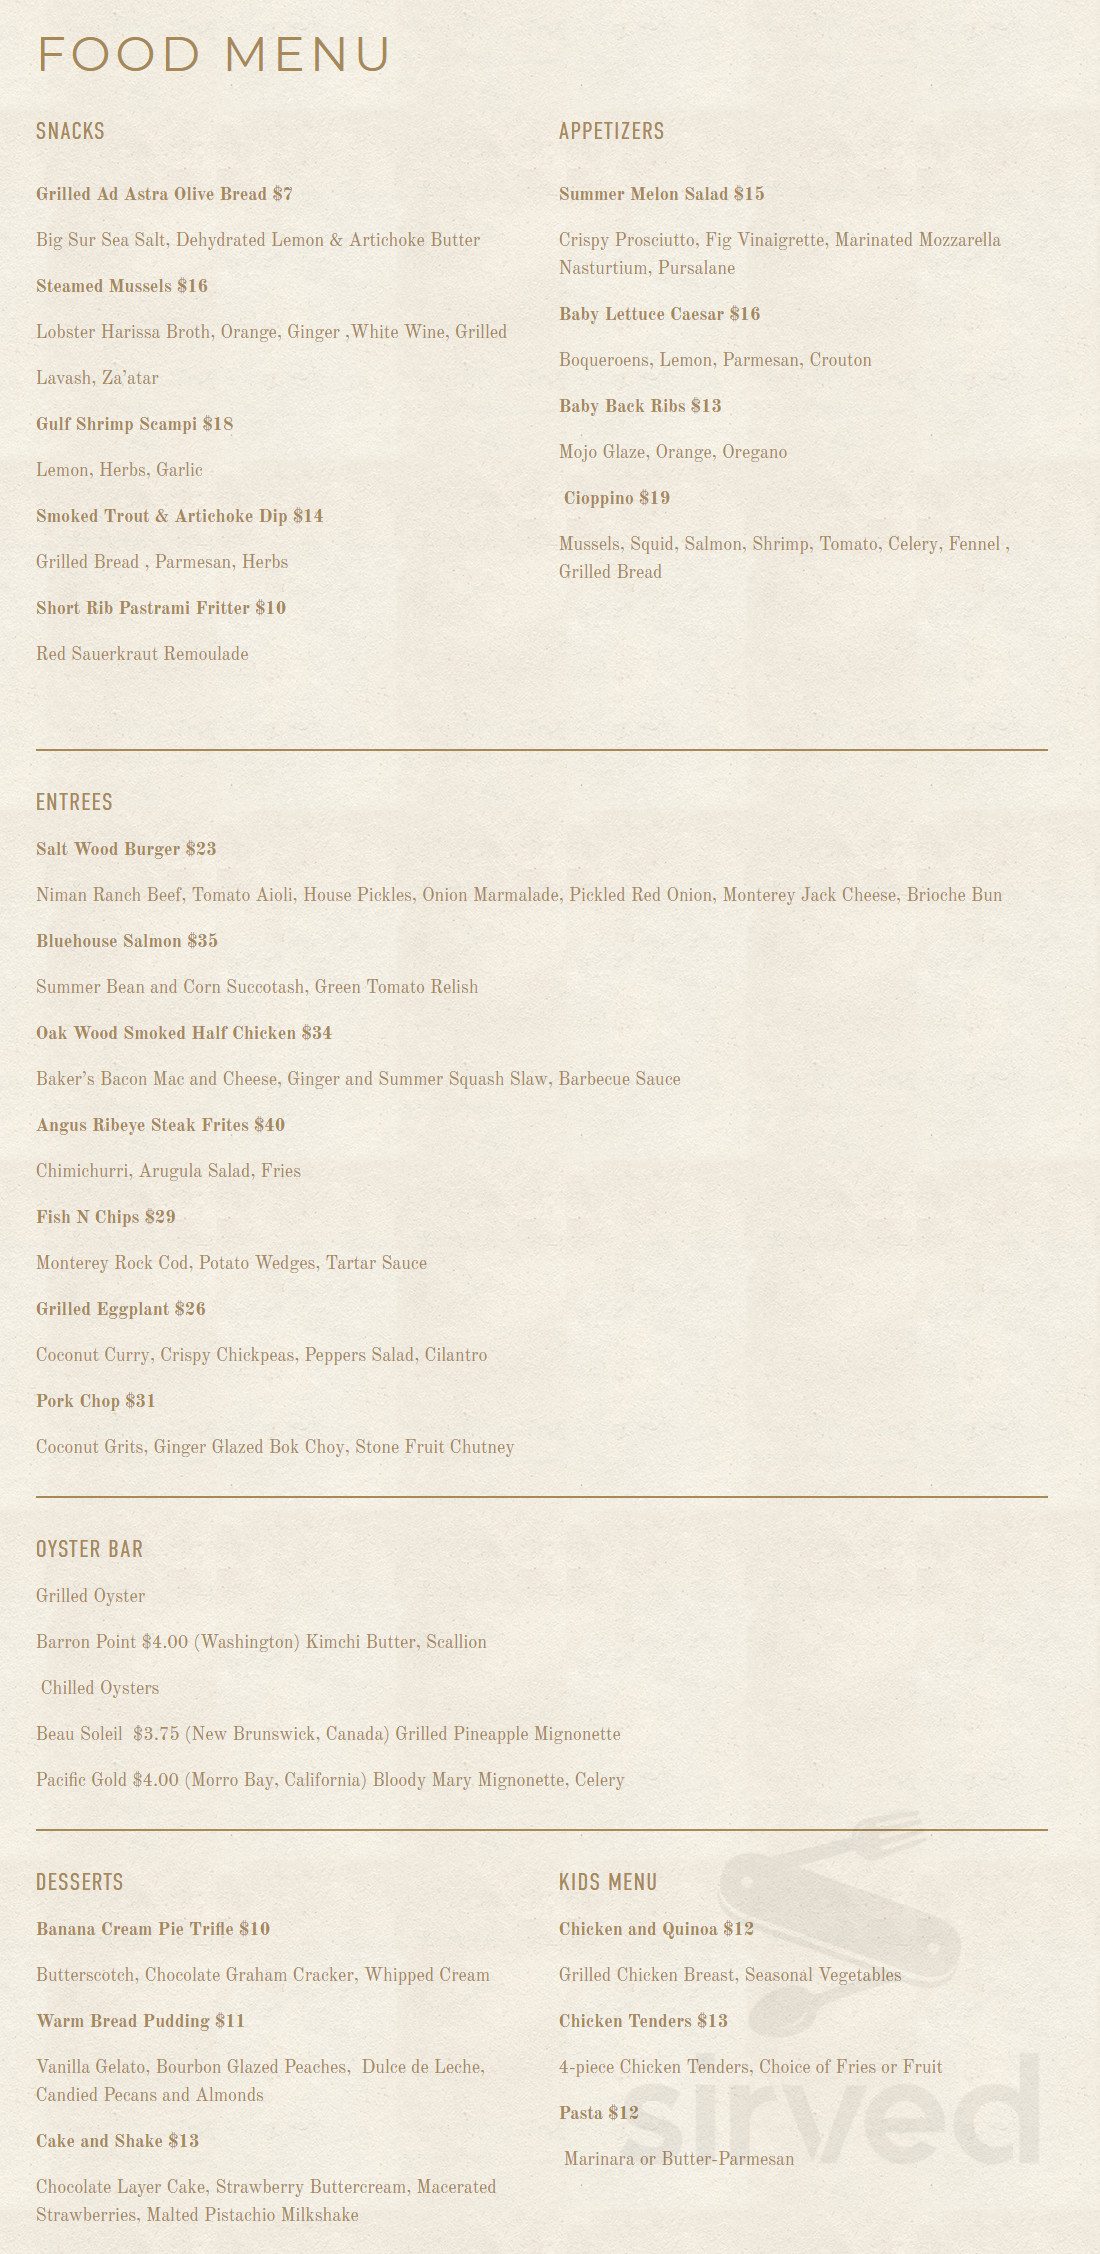 Salt Wood Kitchen And Oysterette Menu In Marina California Usa